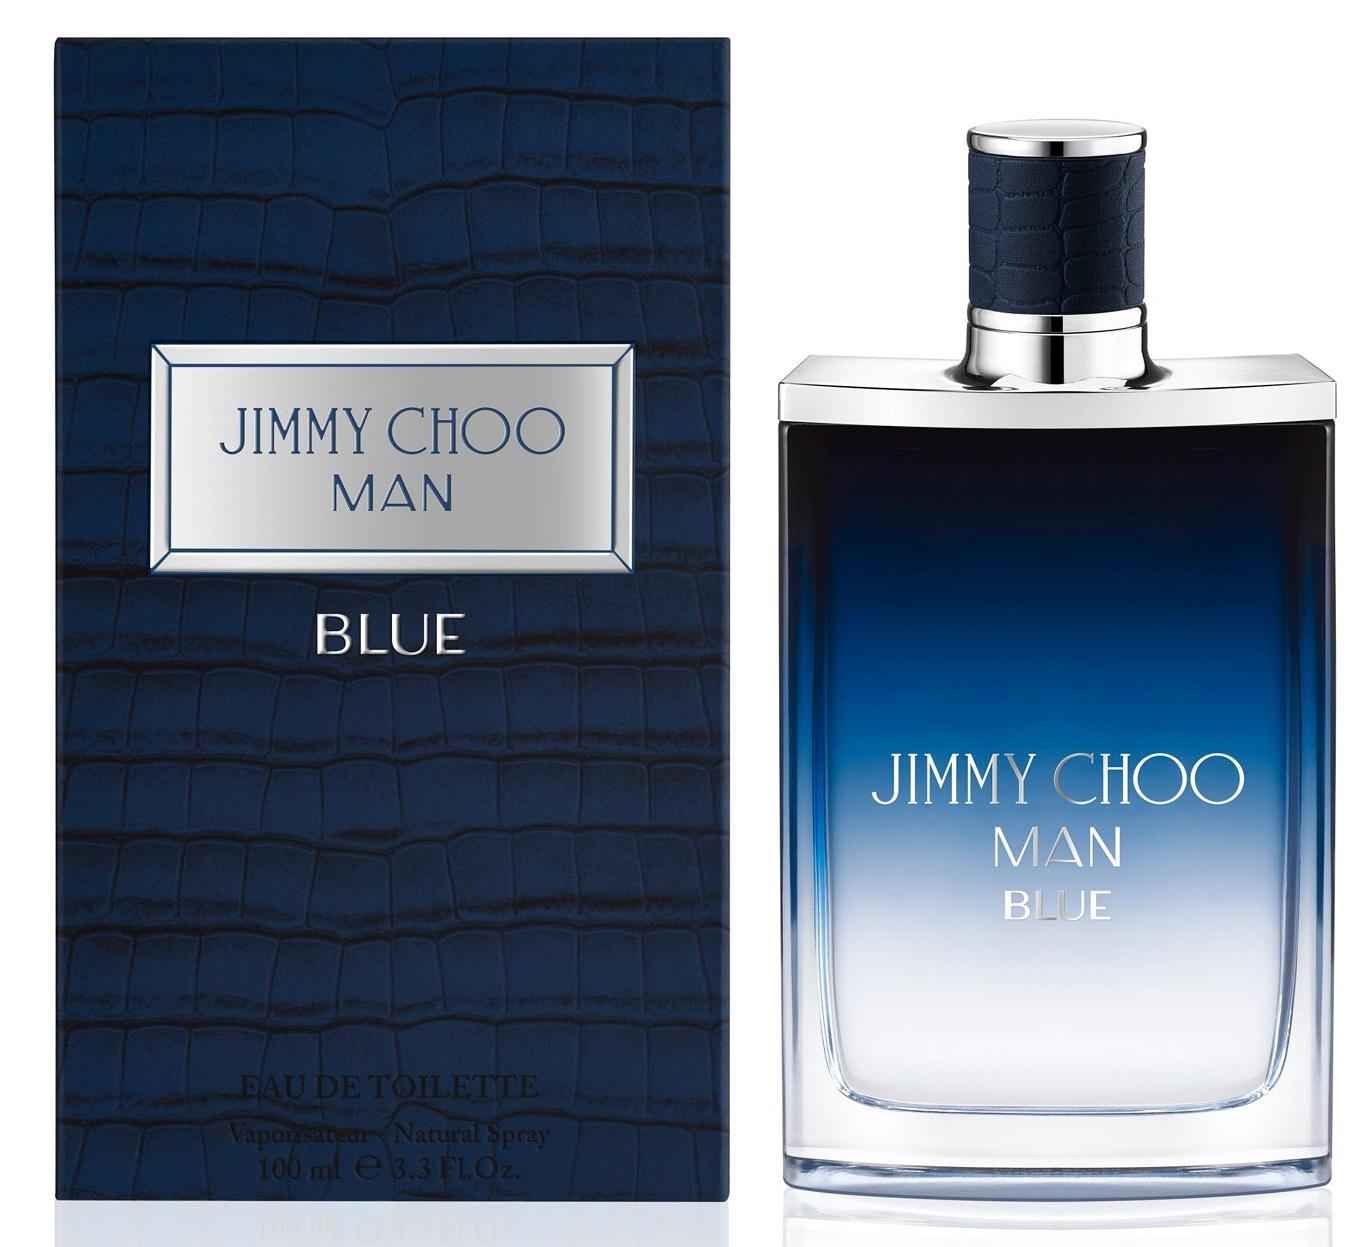 Jimmy Choo: Man Blue Fragrance (EDT, 50ml) image